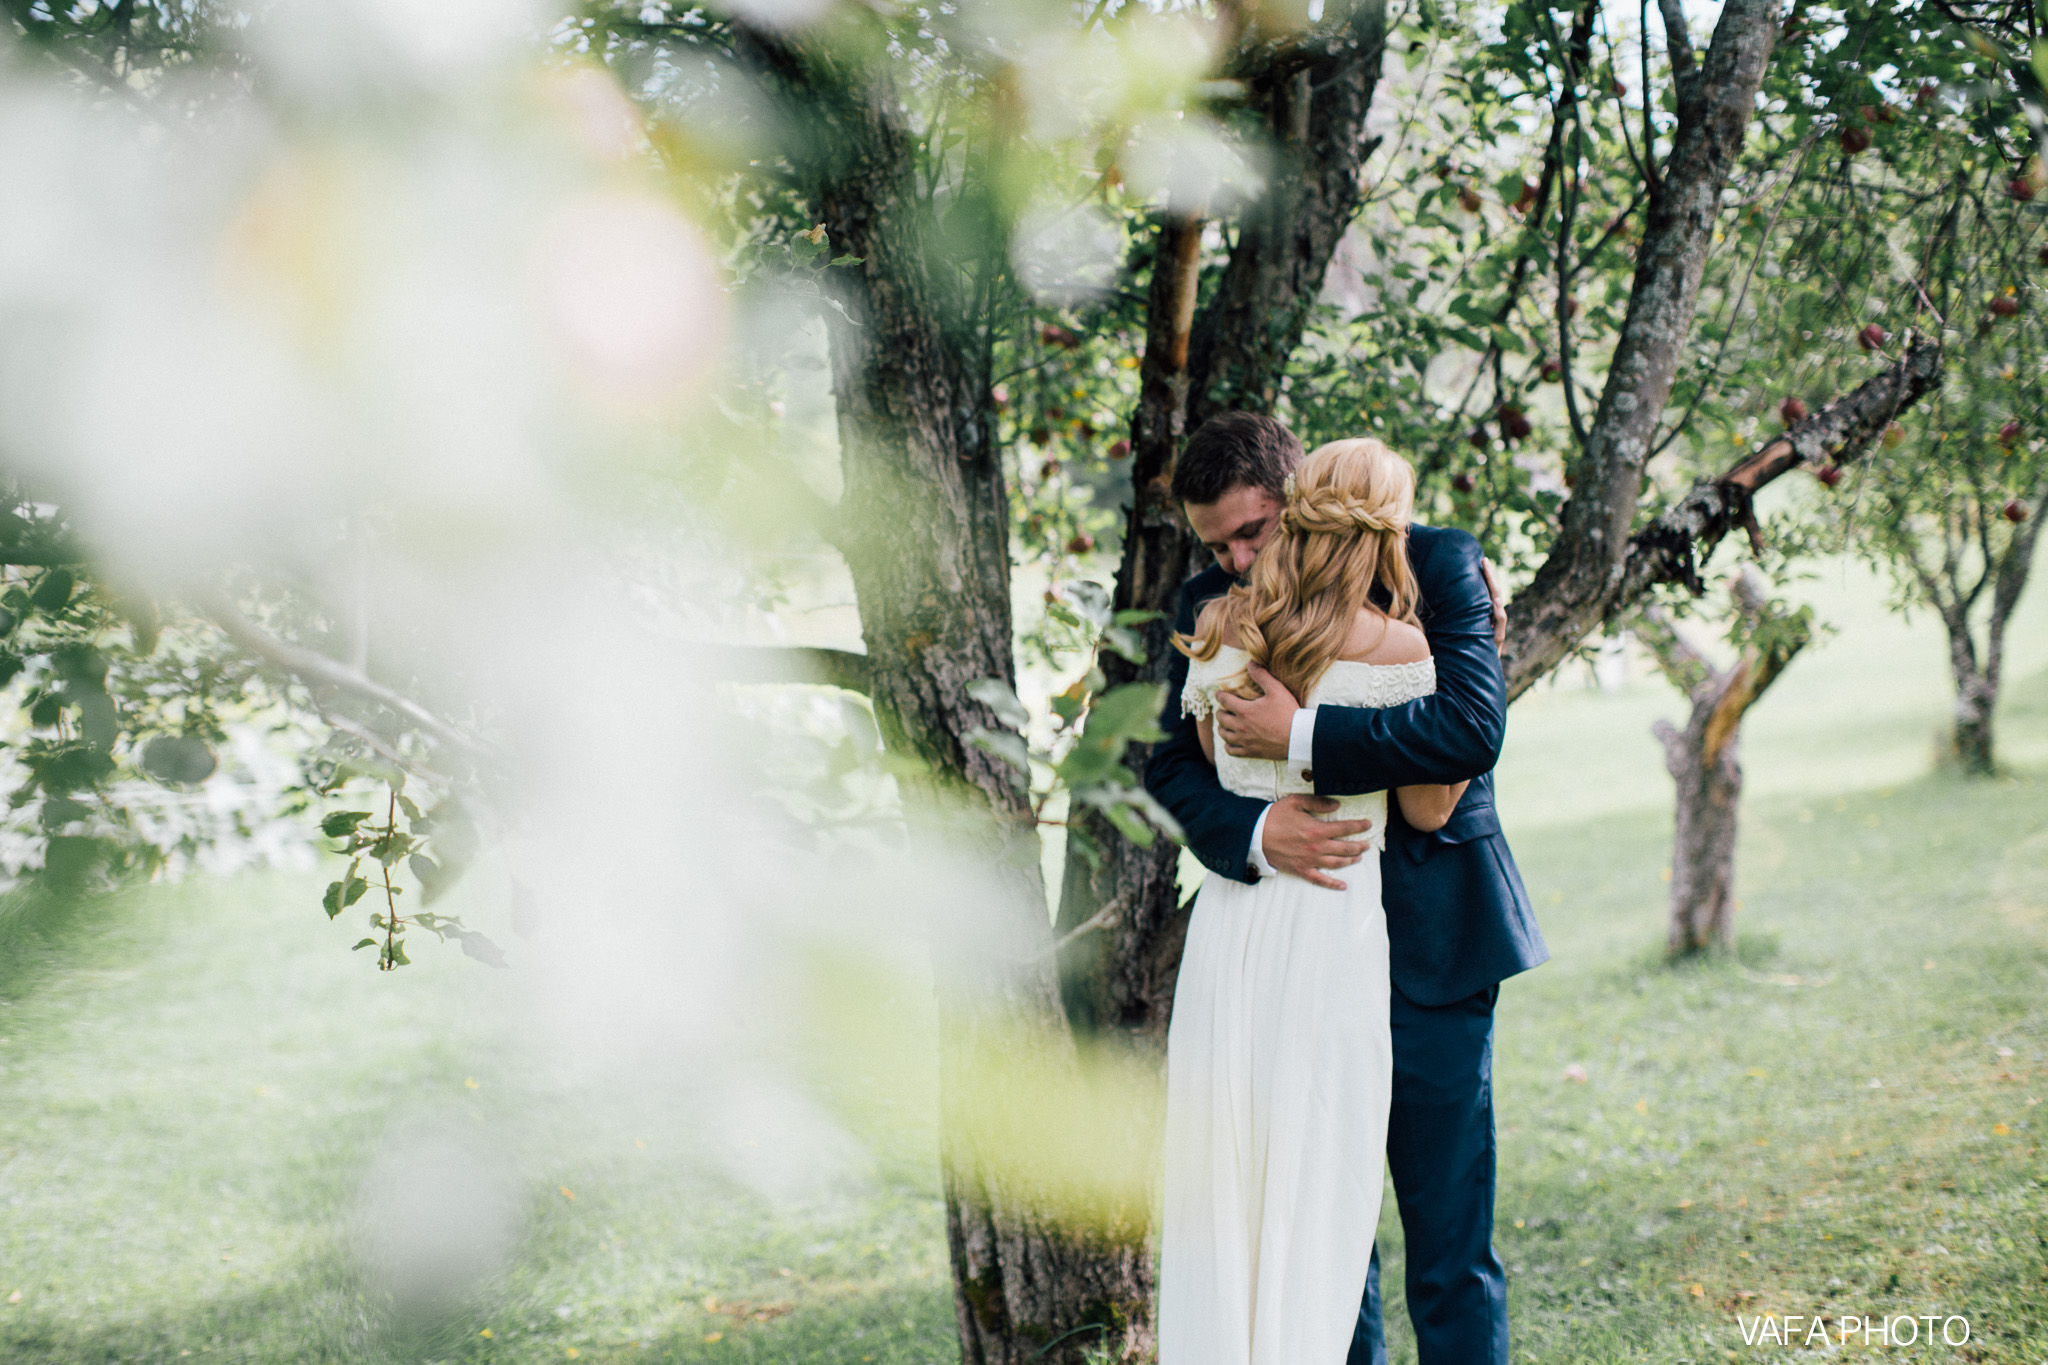 Belsolda-Farm-Wedding-Christy-Eric-Vafa-Photo-47.jpg